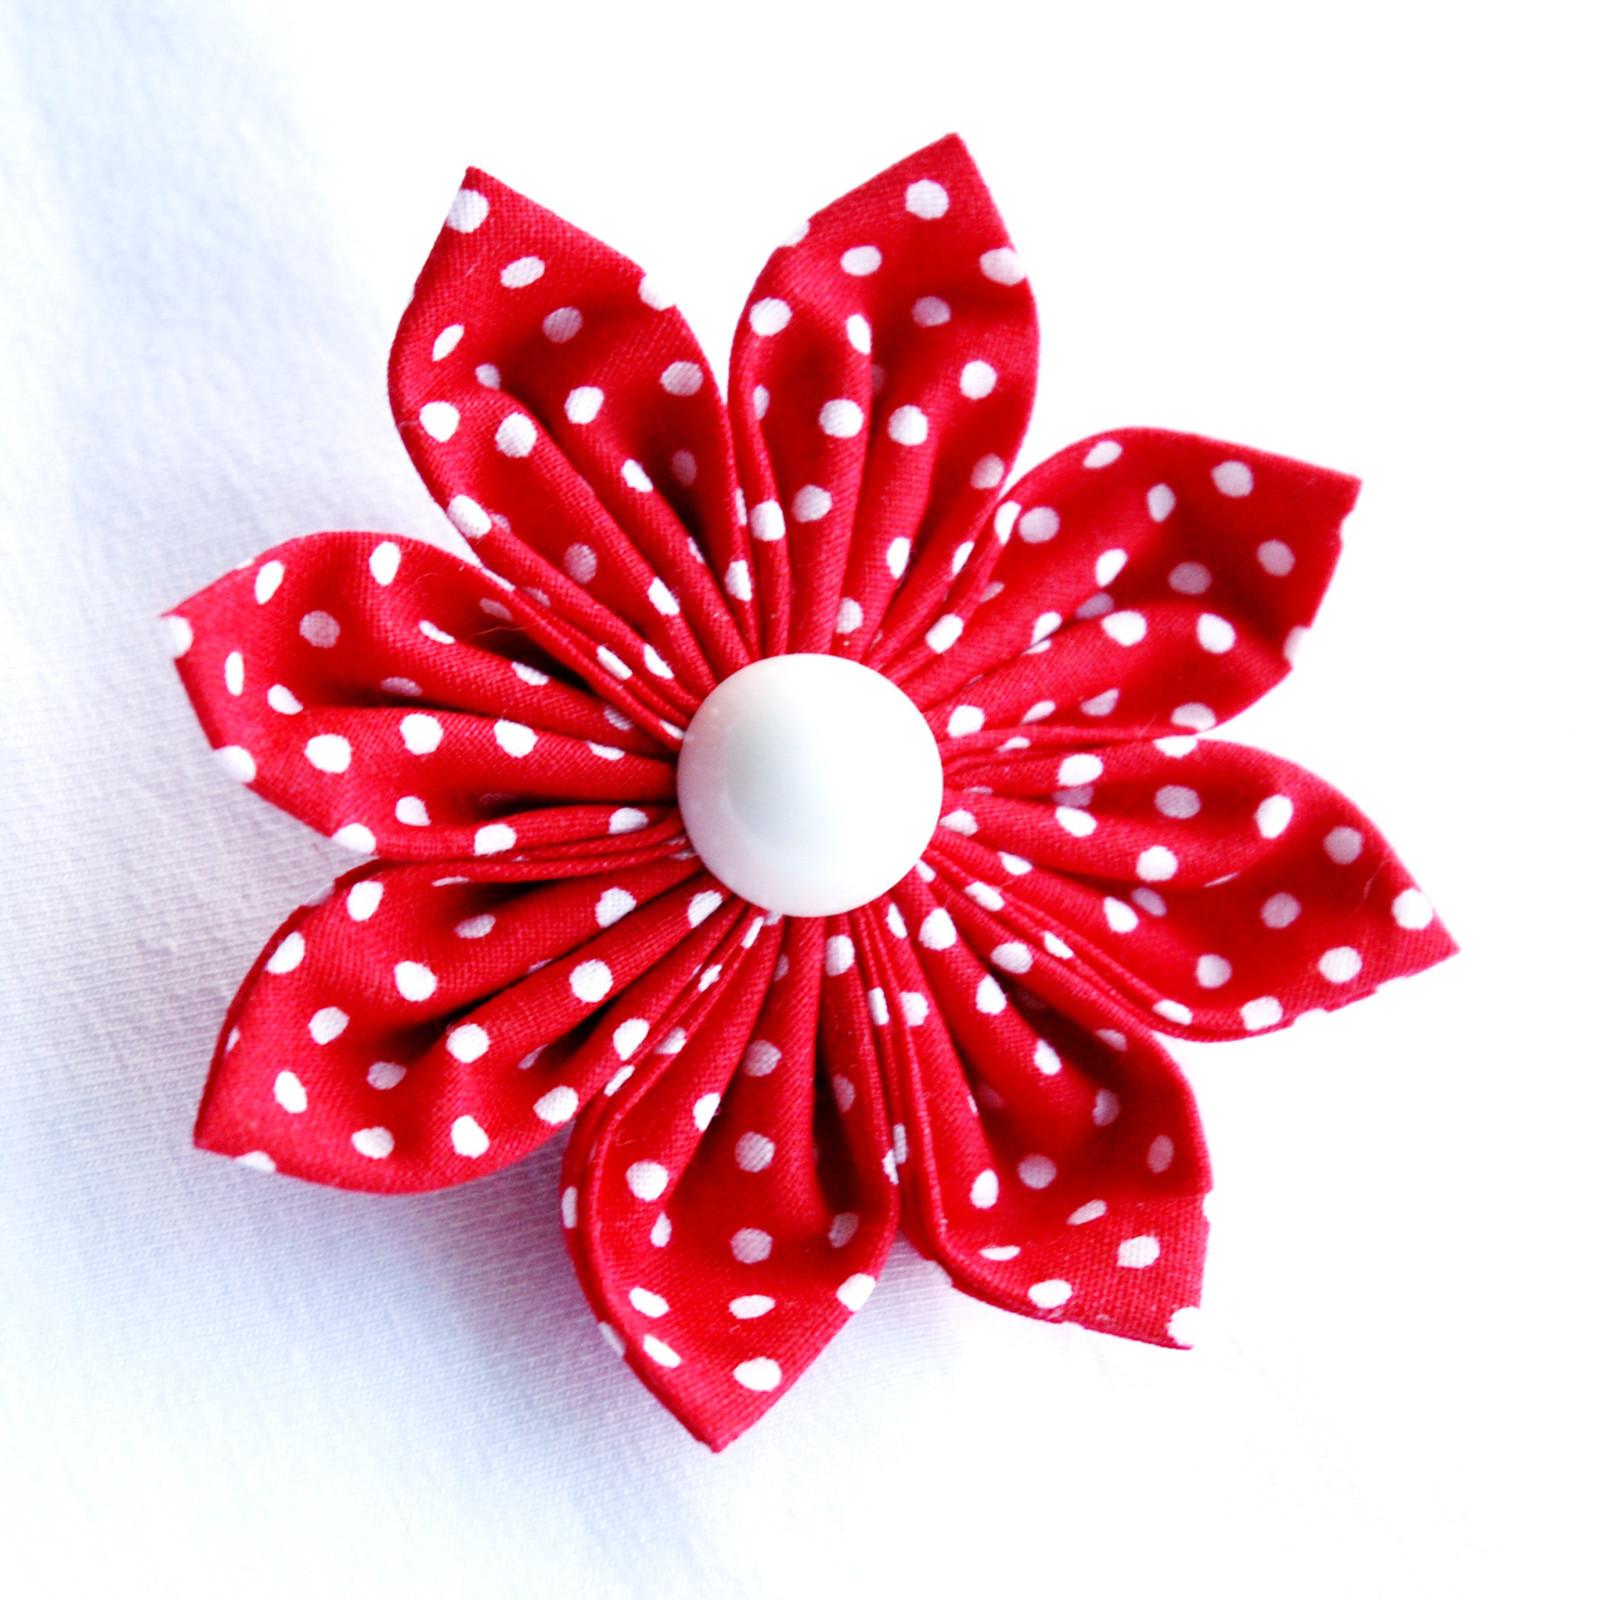 30207e7d489 Červená puntíkovaná kytka (brož)   Zboží prodejce Princezna ...